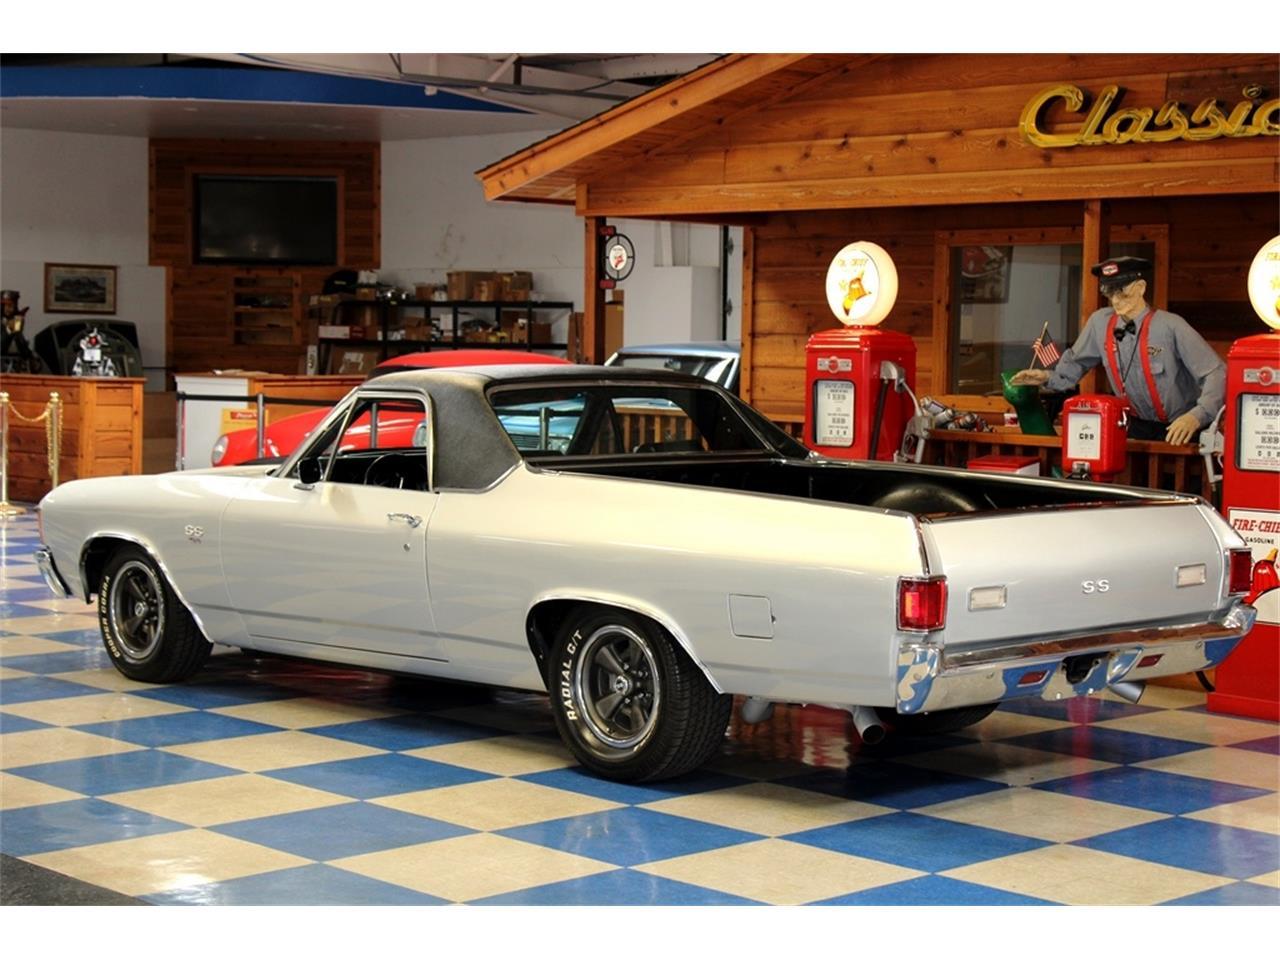 1972 Chevrolet El Camino (CC-1297914) for sale in New Braunfels, Texas